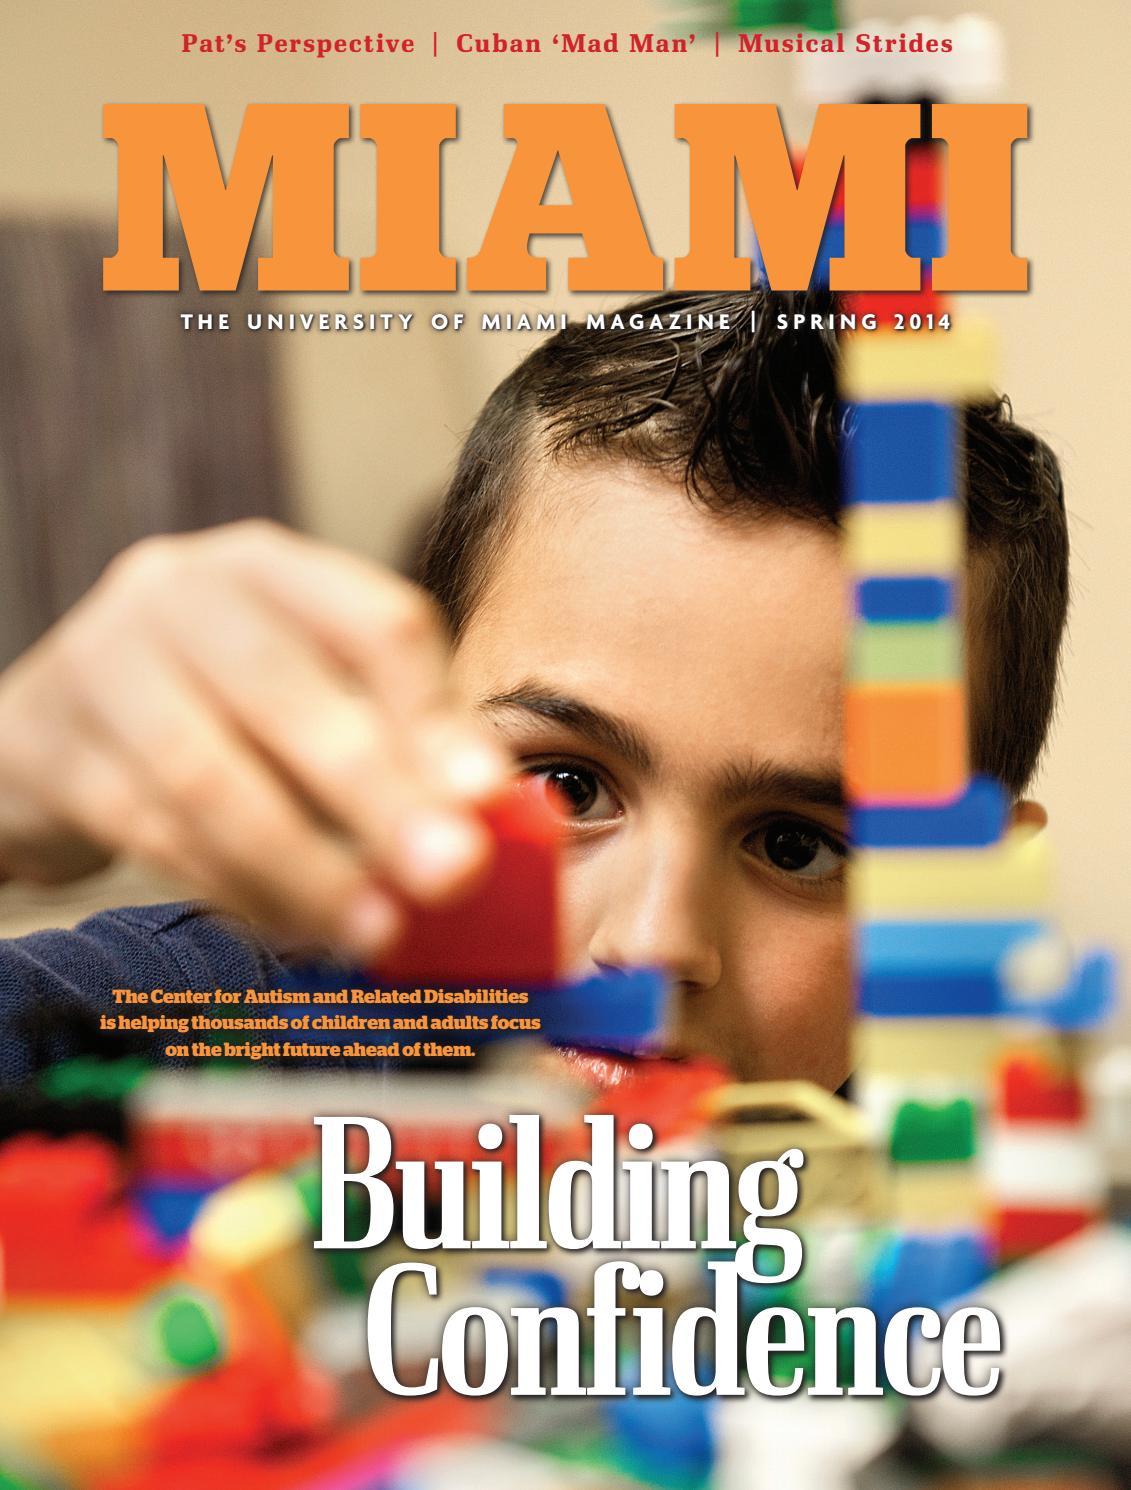 Miami Magazine | Spring 2014 by University of Miami - issuu